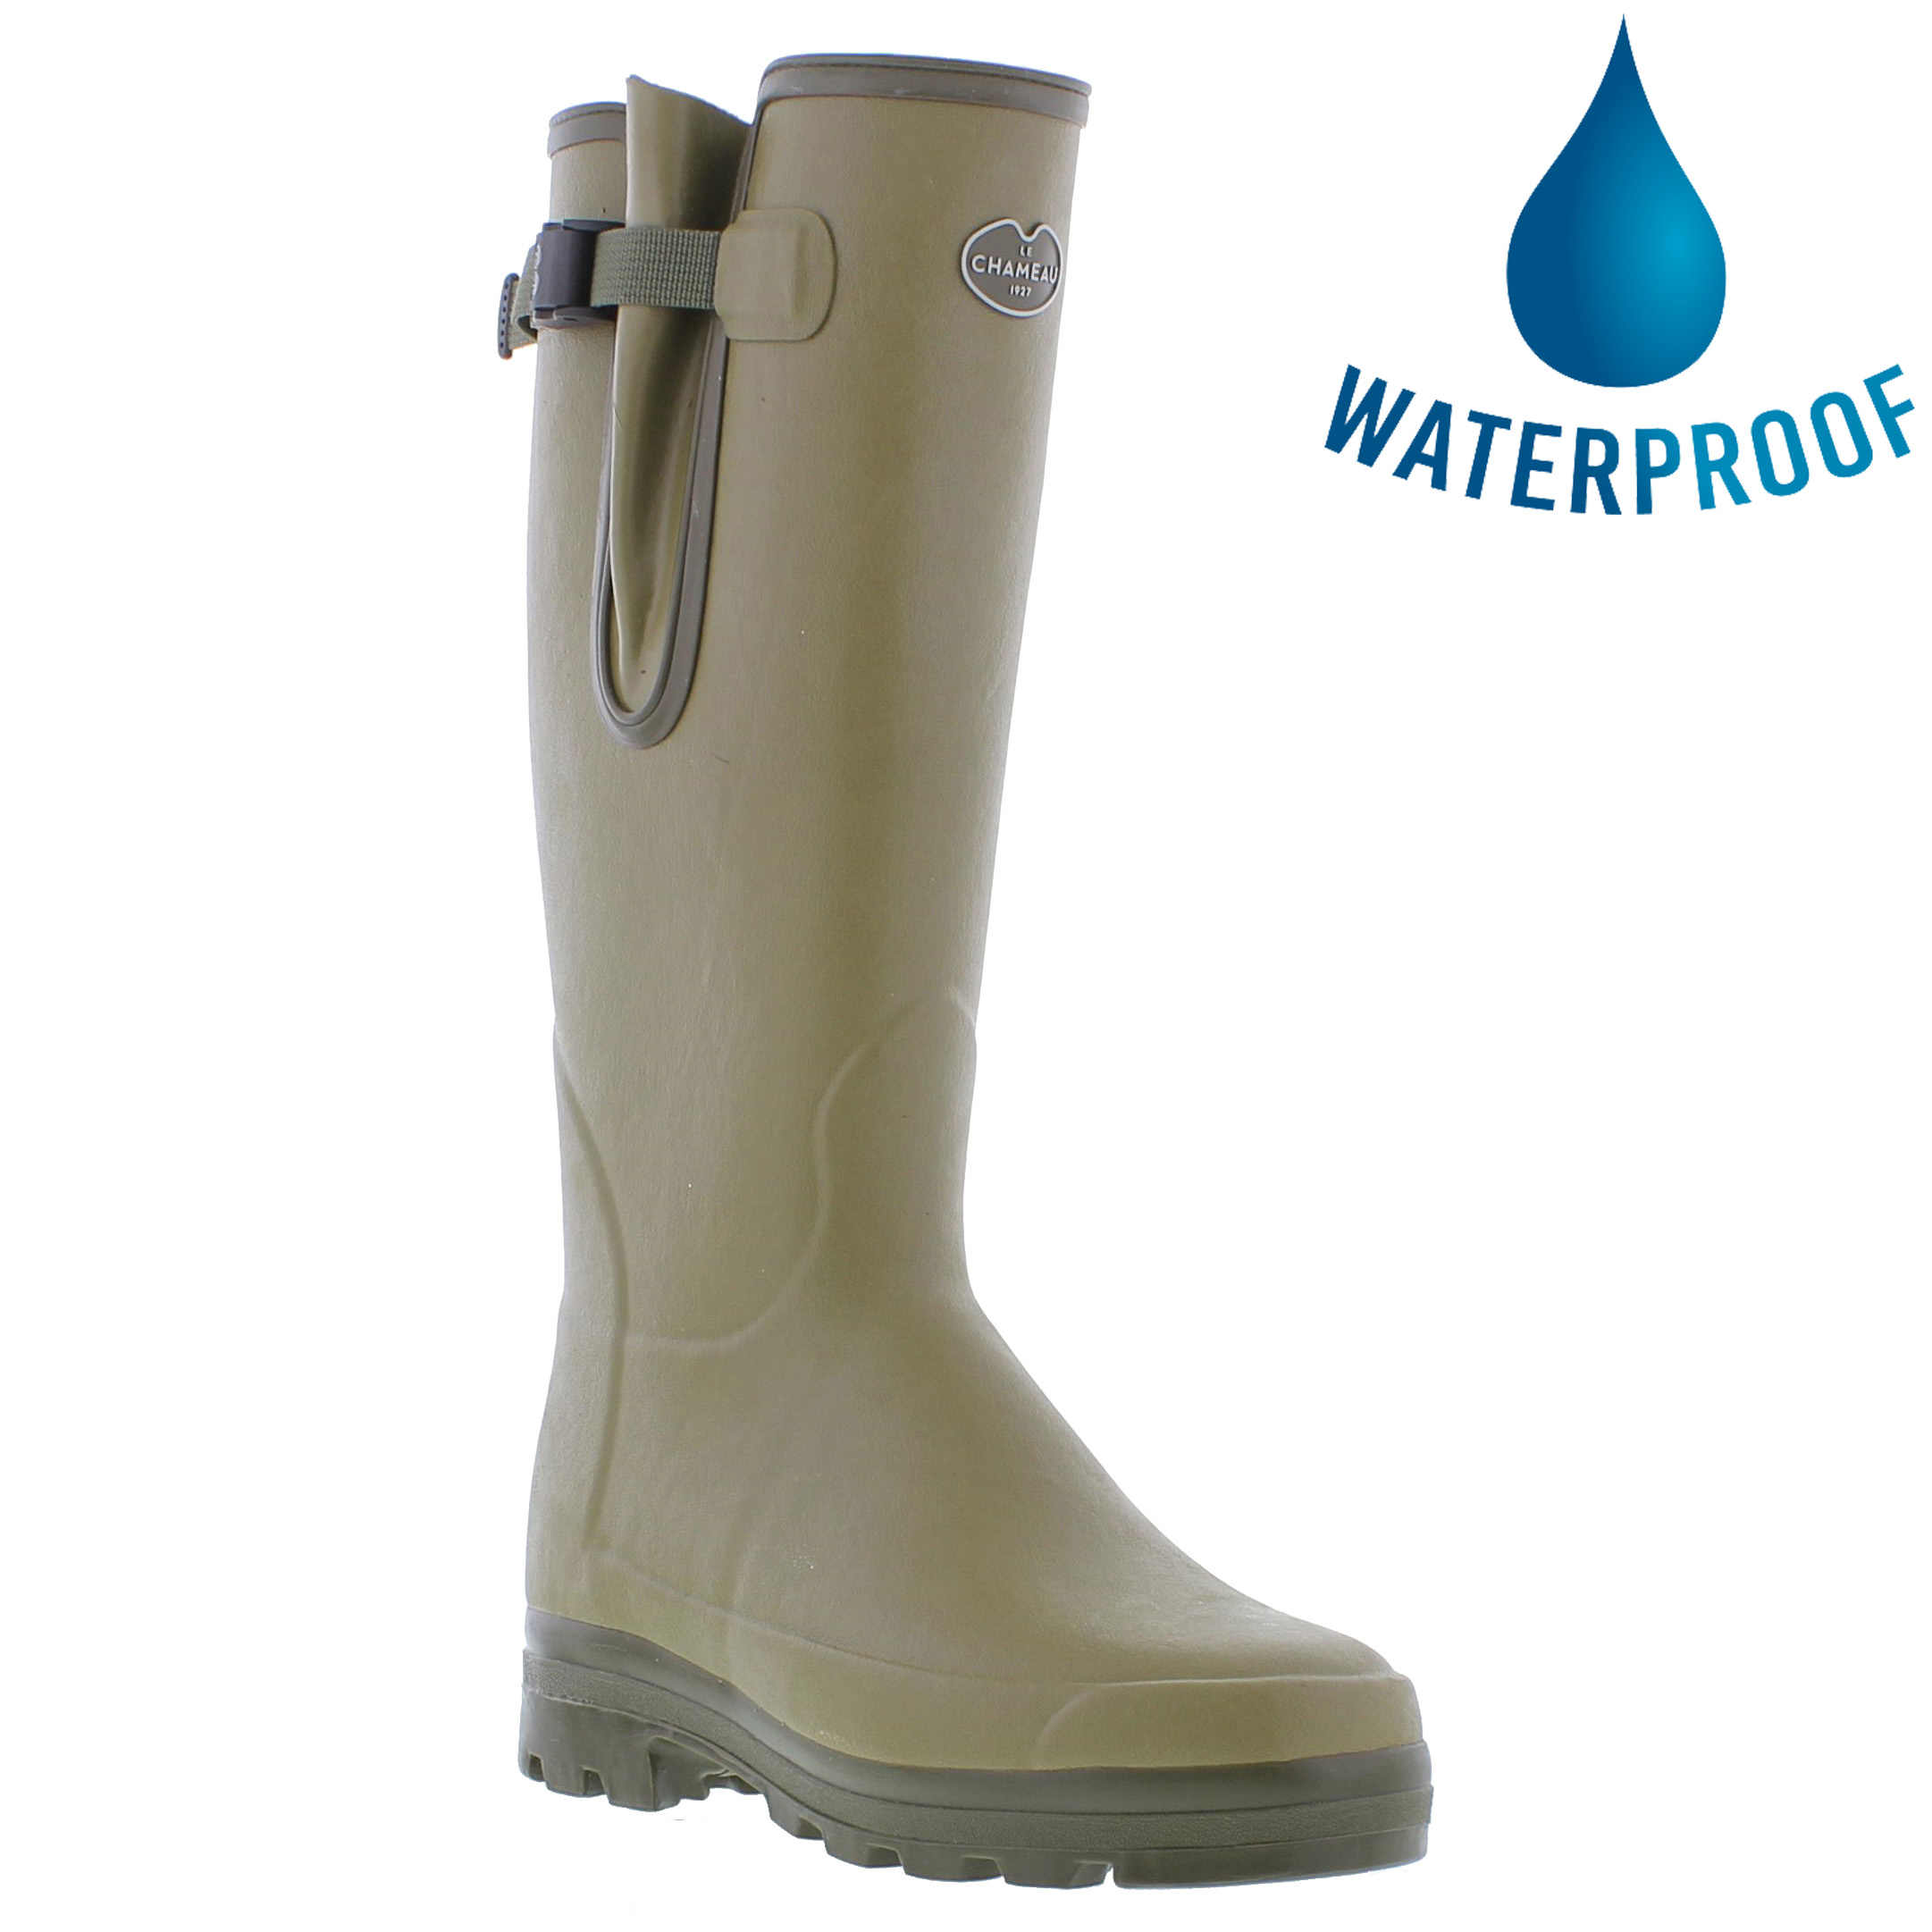 Le Chameau Mens Vierzonord Neoprene Lined Wellies Rain Boots - Vert